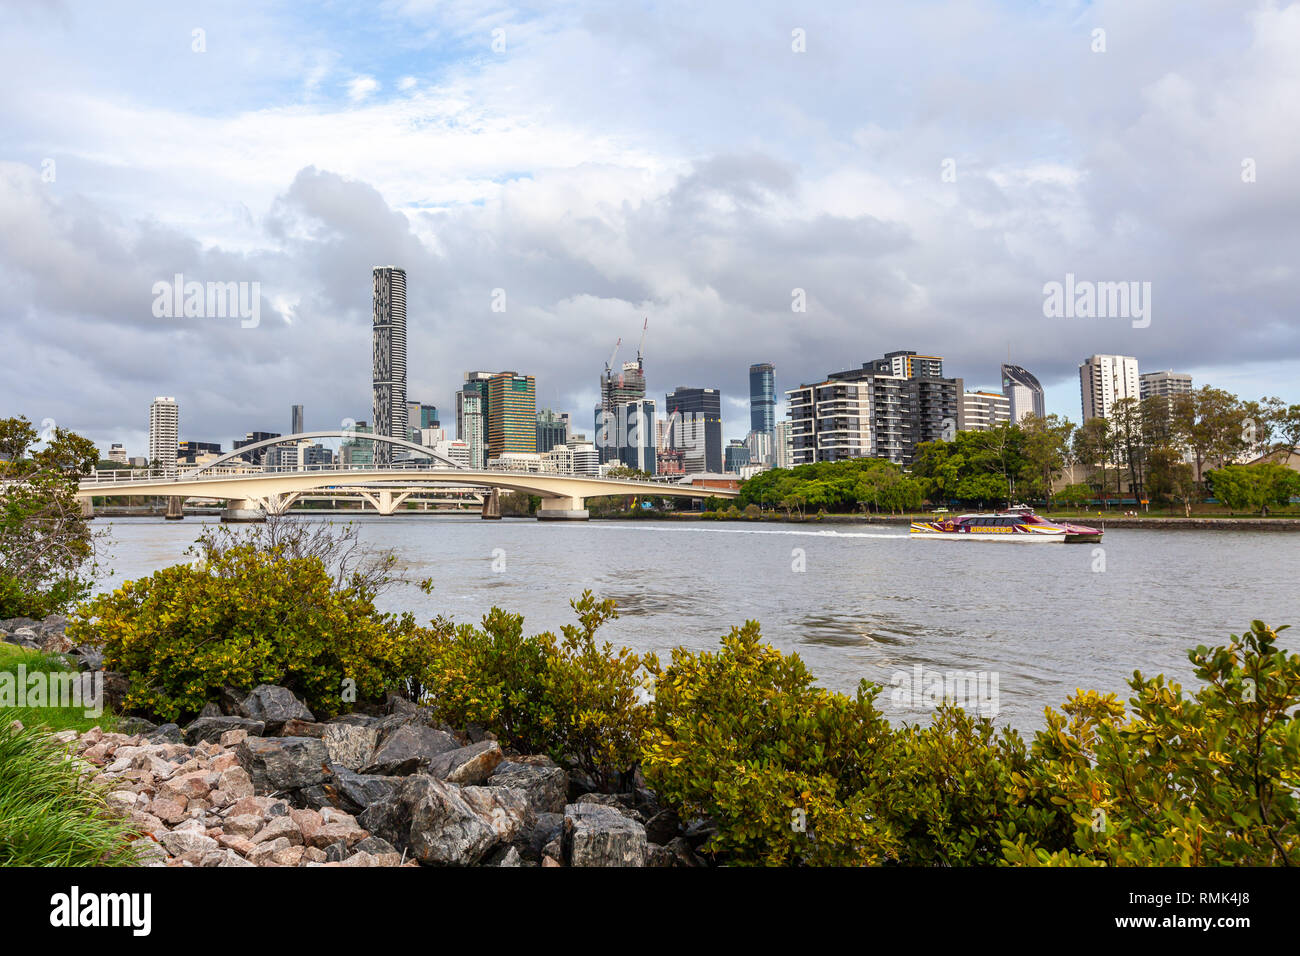 BRISBANE, Australia - January 9 2019: CityCat ferry sailing the Brisbane river among the high-rise buildings - Stock Image